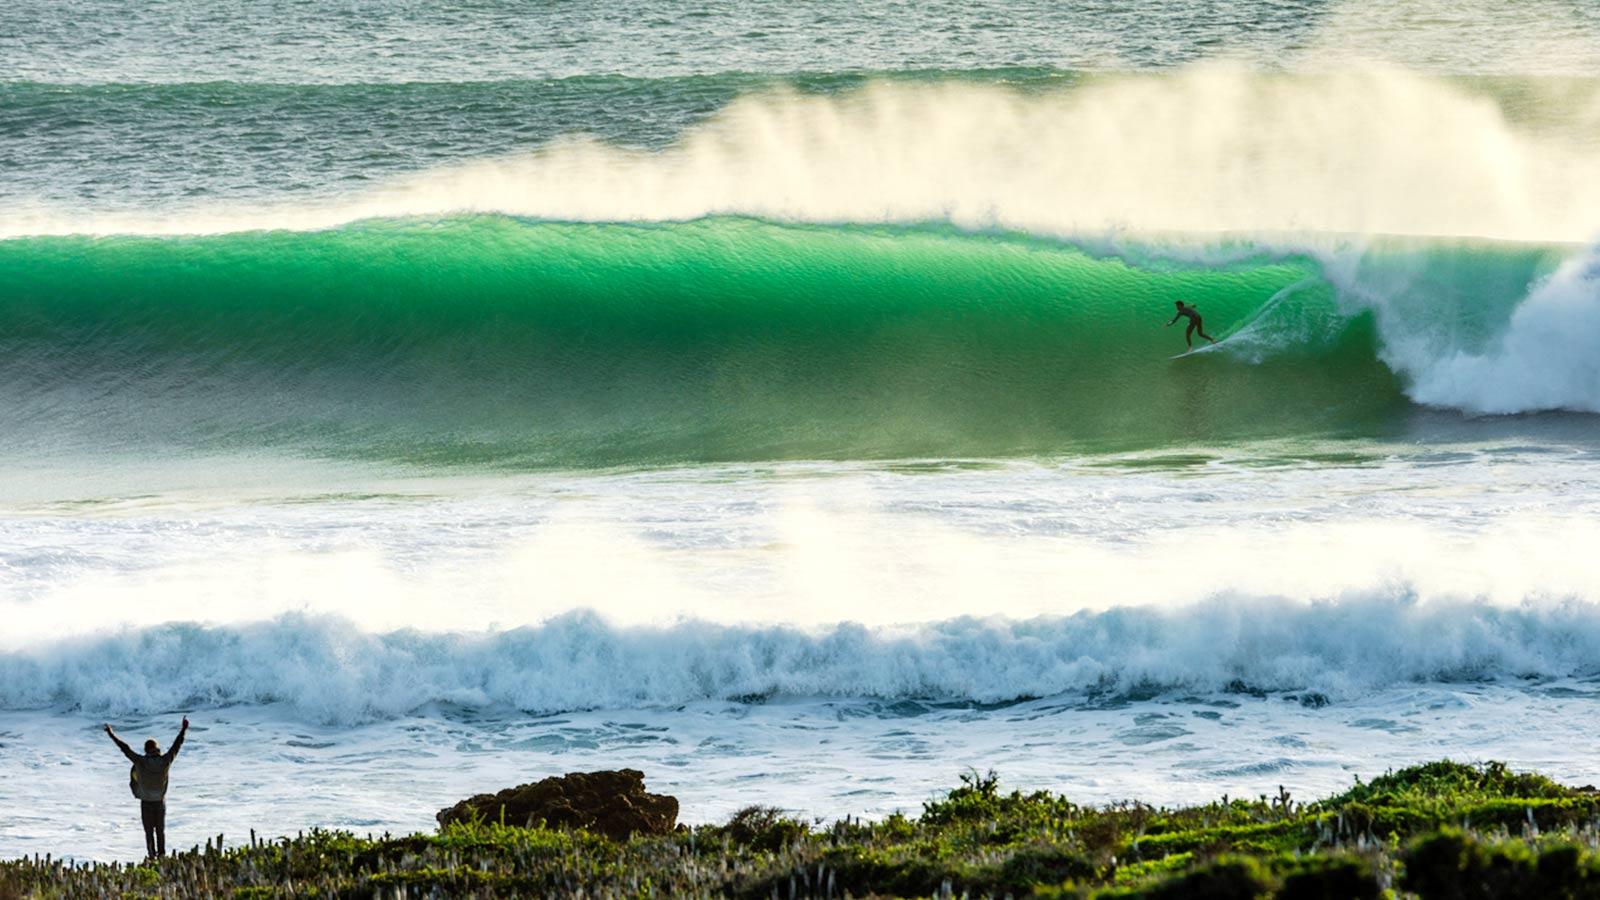 marocco-surf-trip-surfculture-blackwave